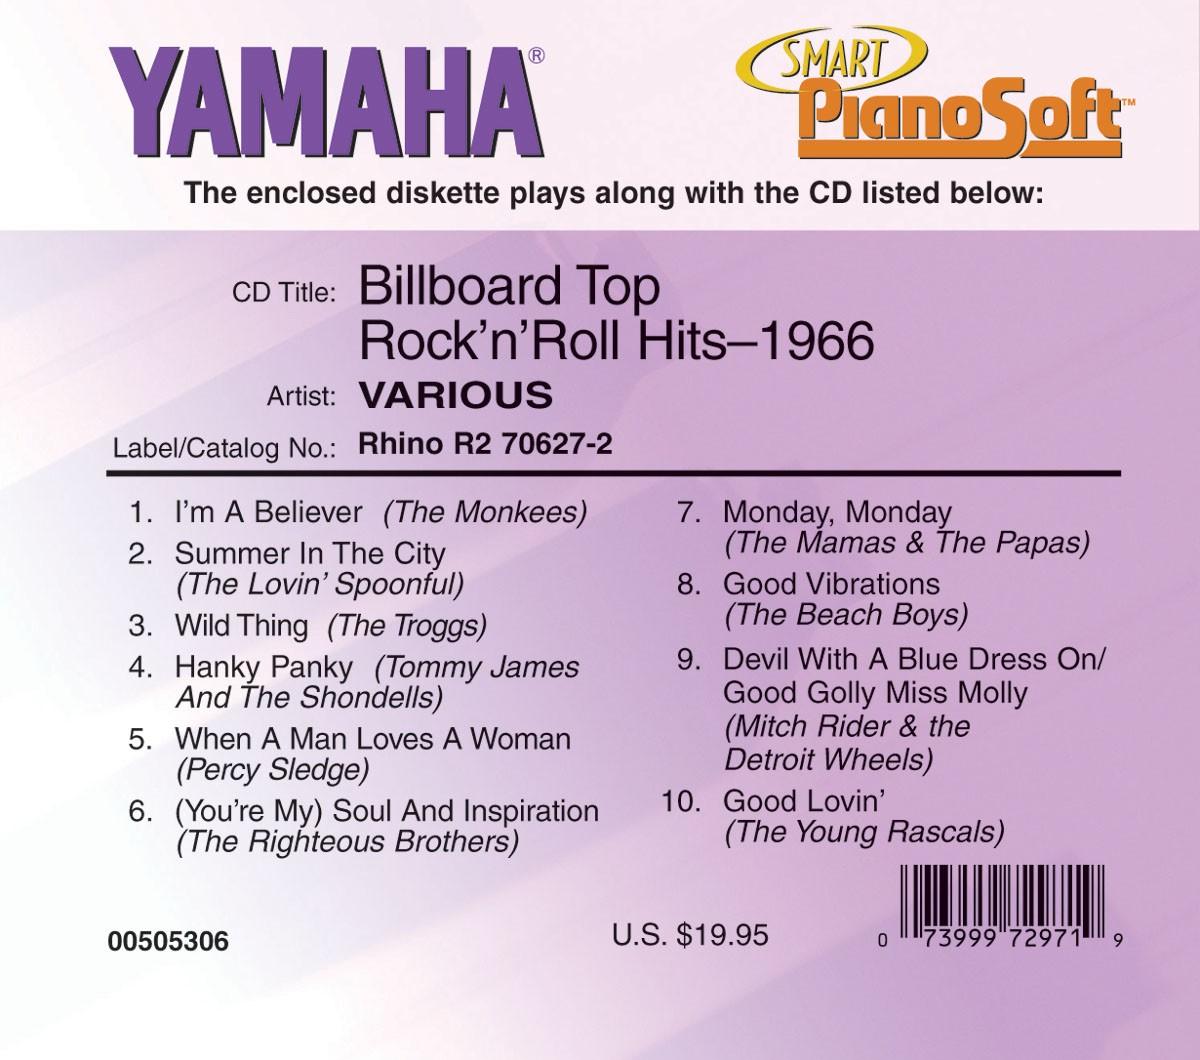 Billboard Top Rock'n'Roll Hits - 1966